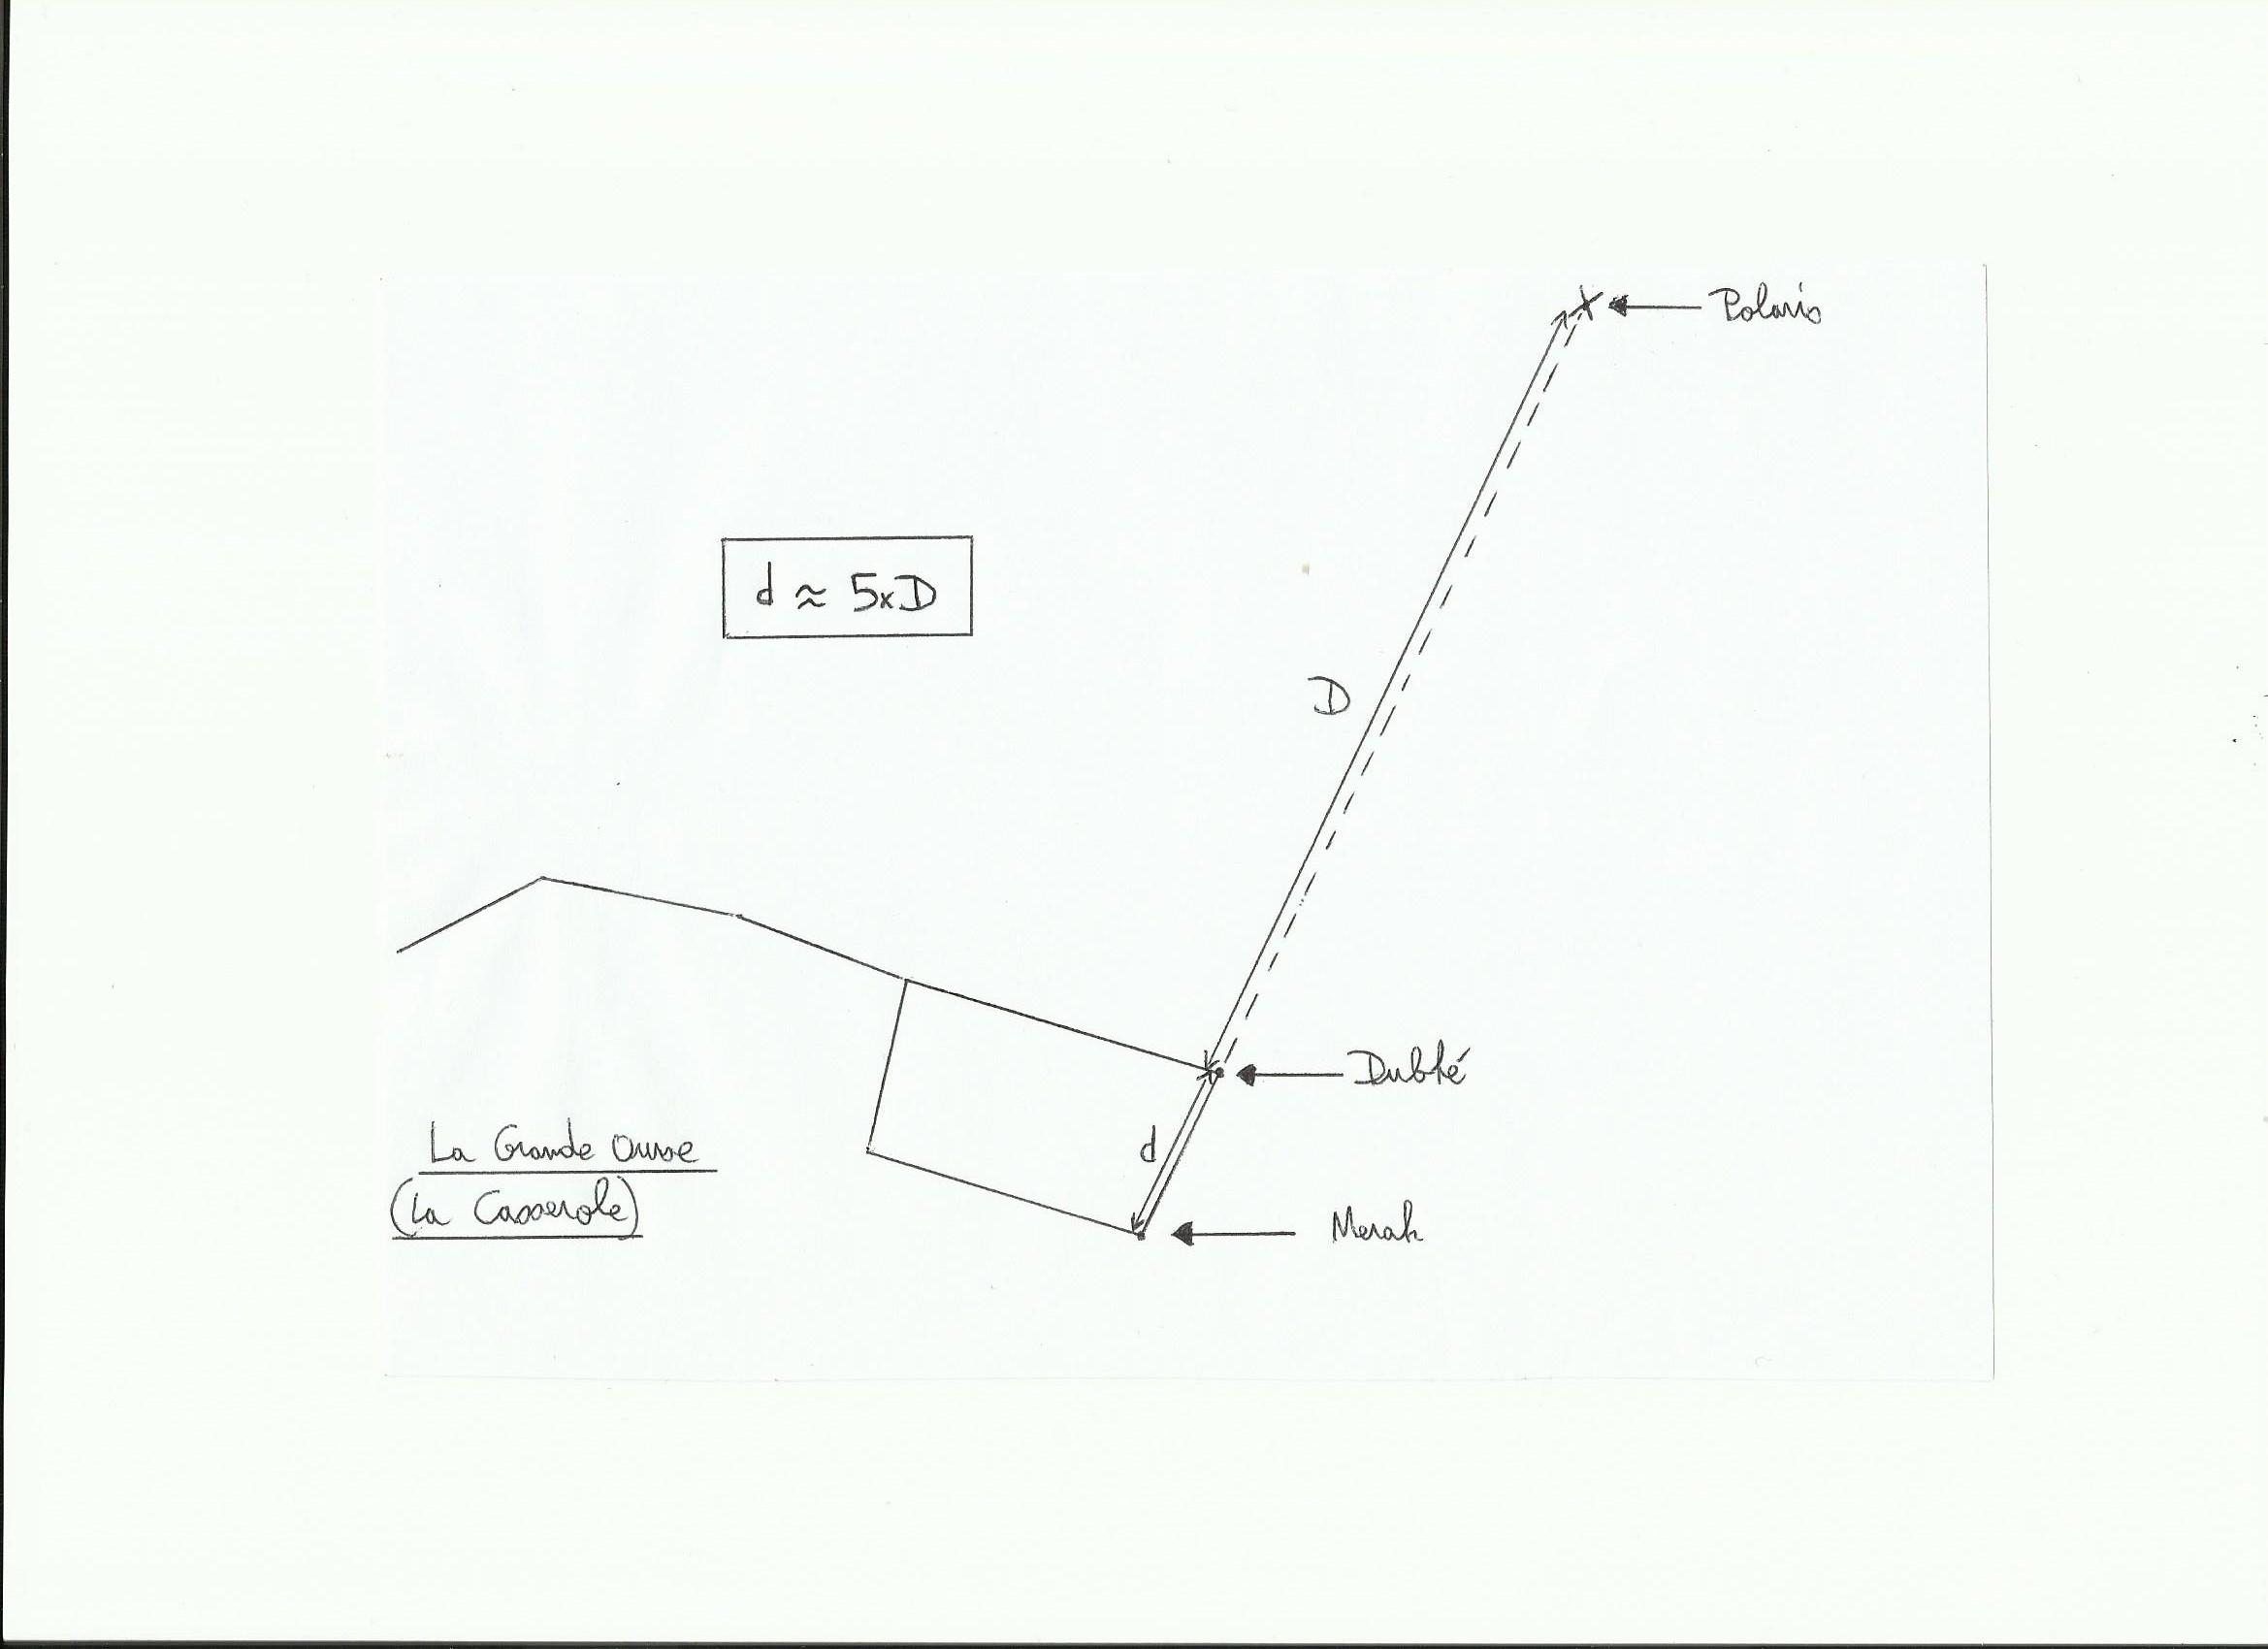 Instruments de navigation : Octants, sextants, baromtres